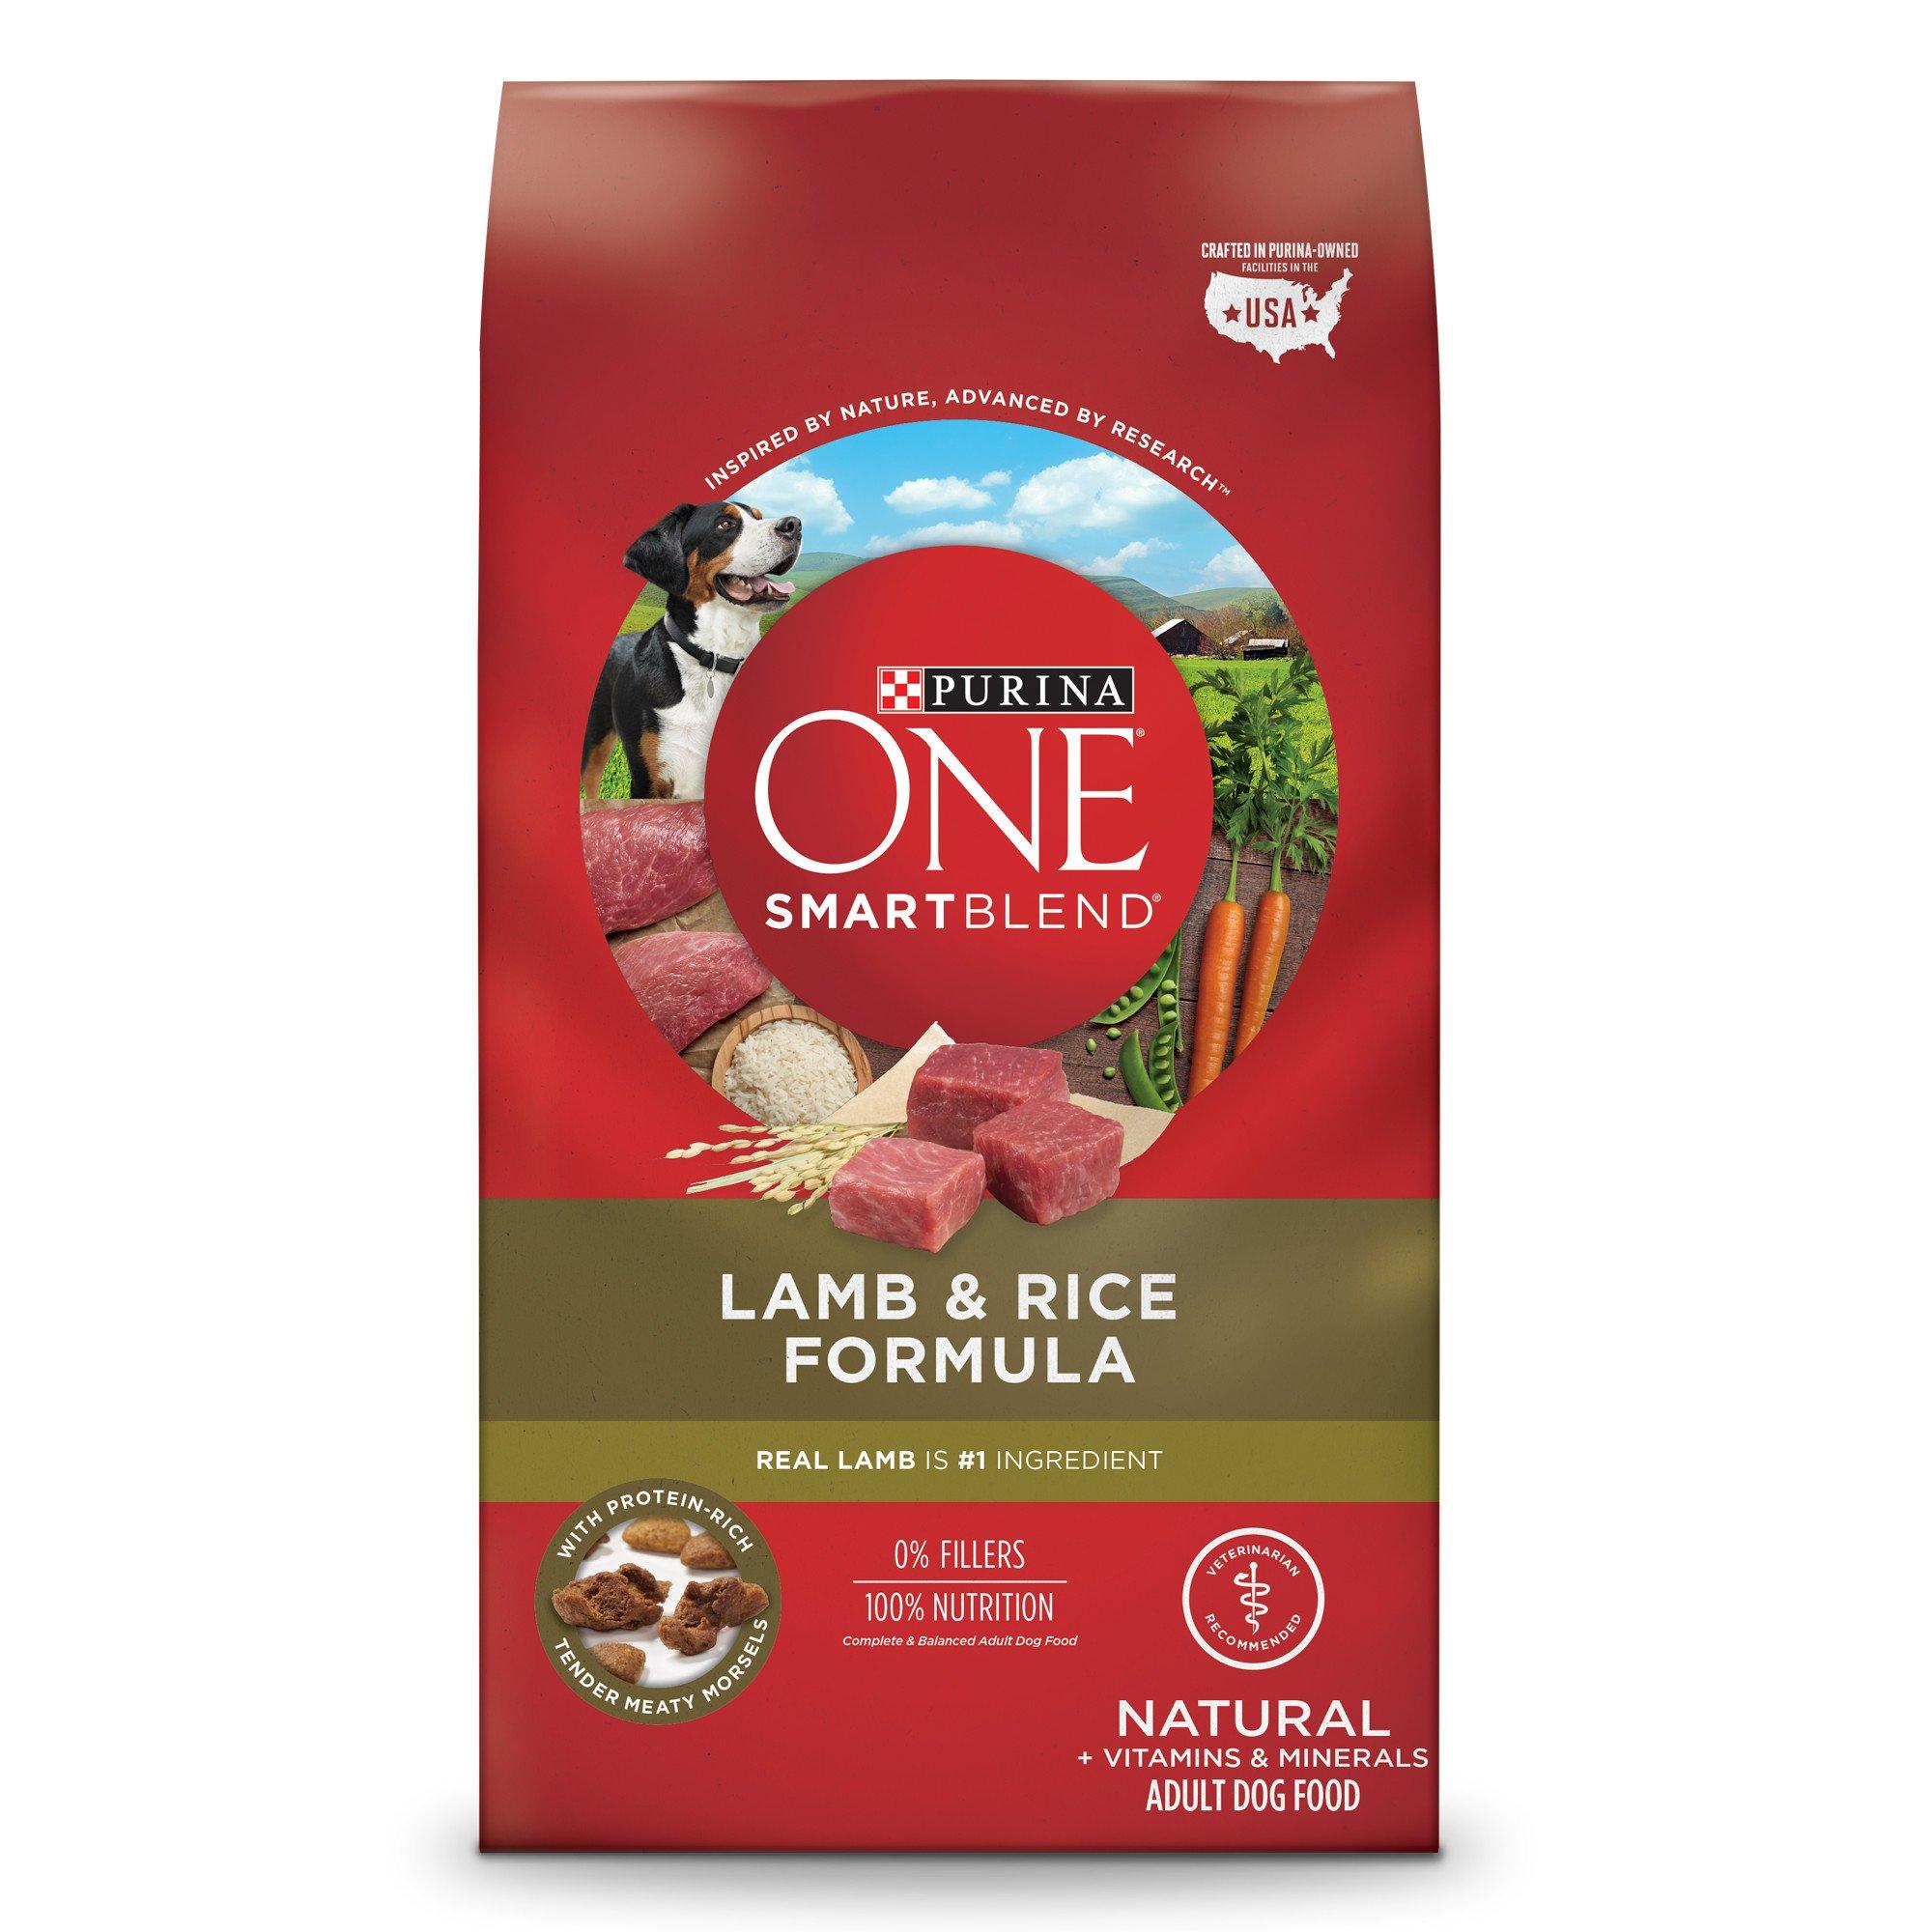 Purina One Smartblend Lamb Amp Rice Formula Dog Food Petco